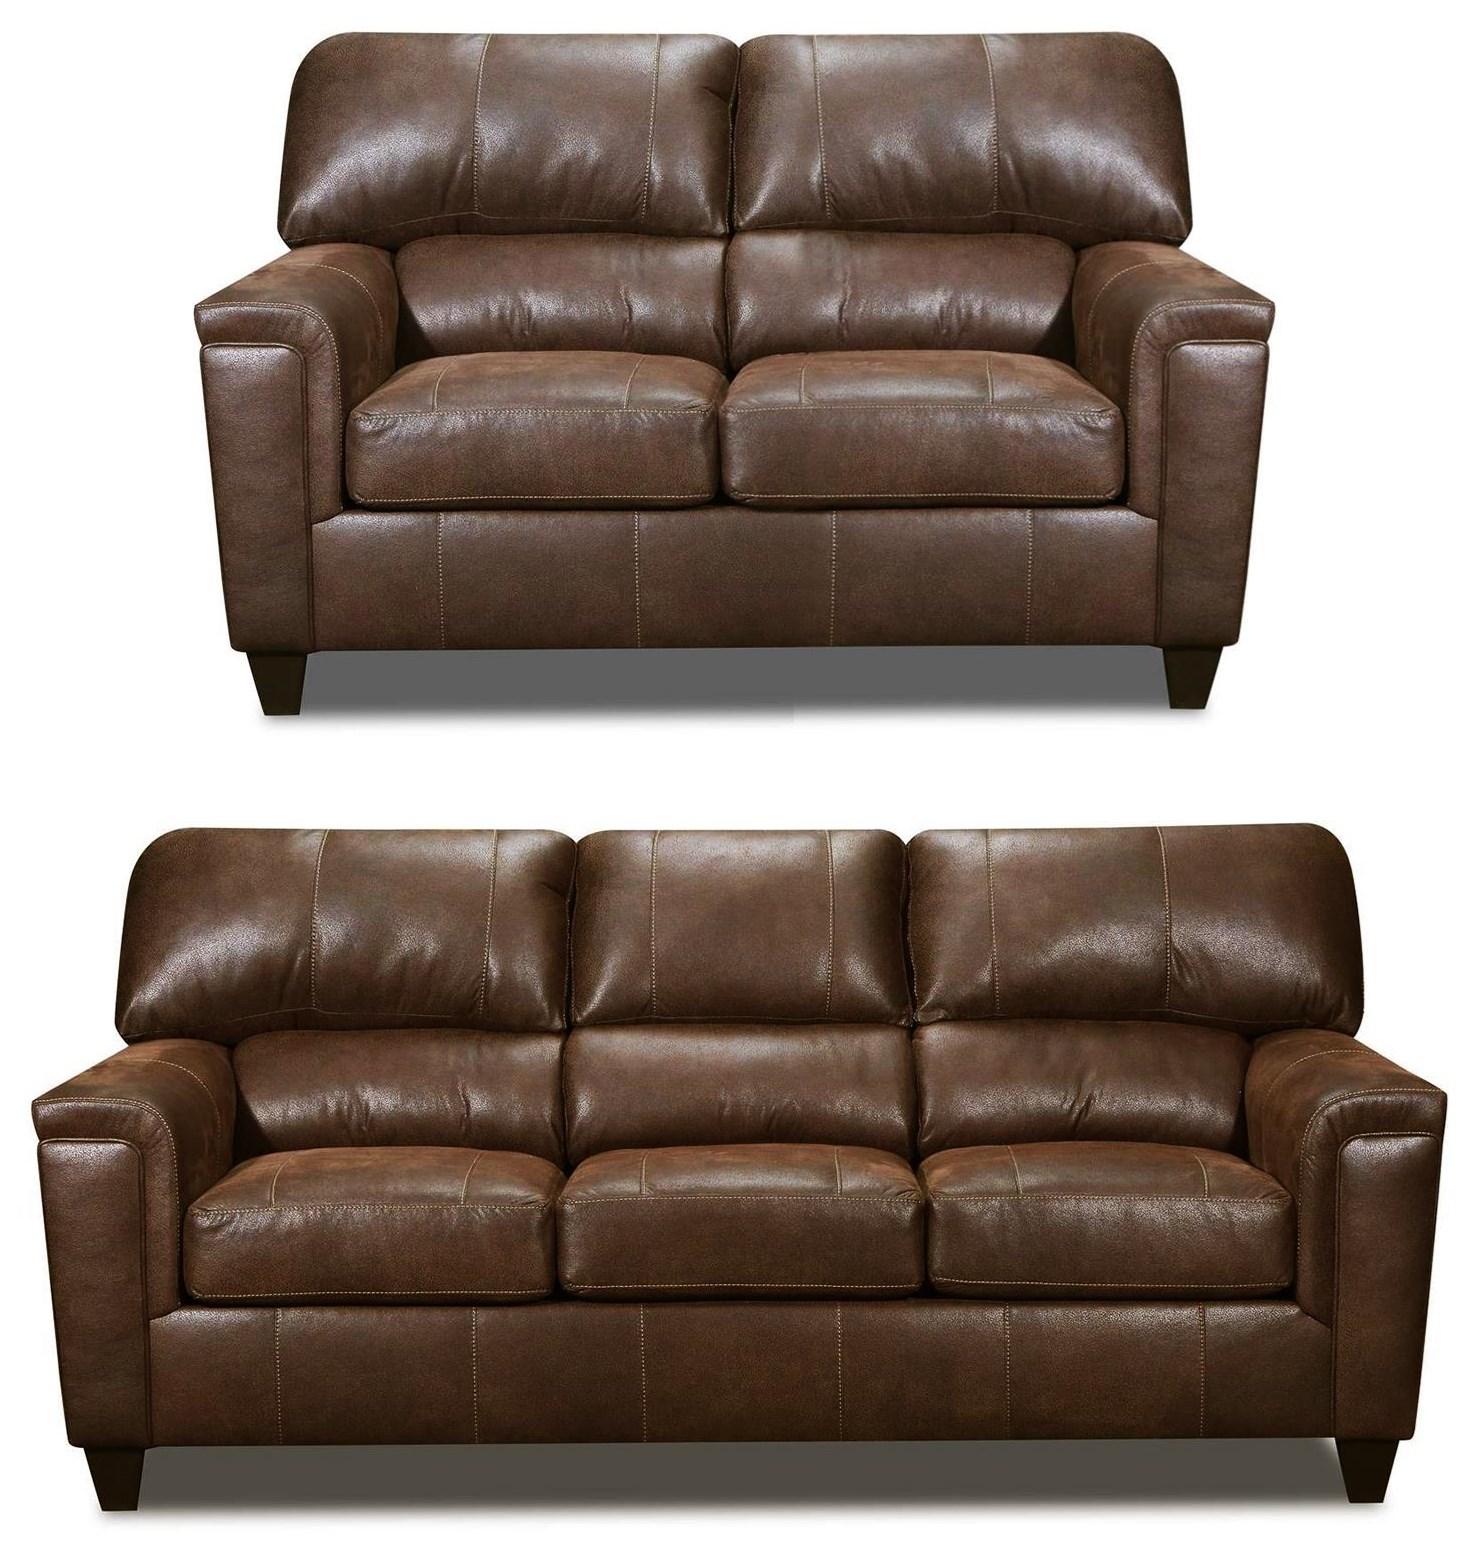 Key Largo 2PC Sofa & Loveseat Set at Rotmans